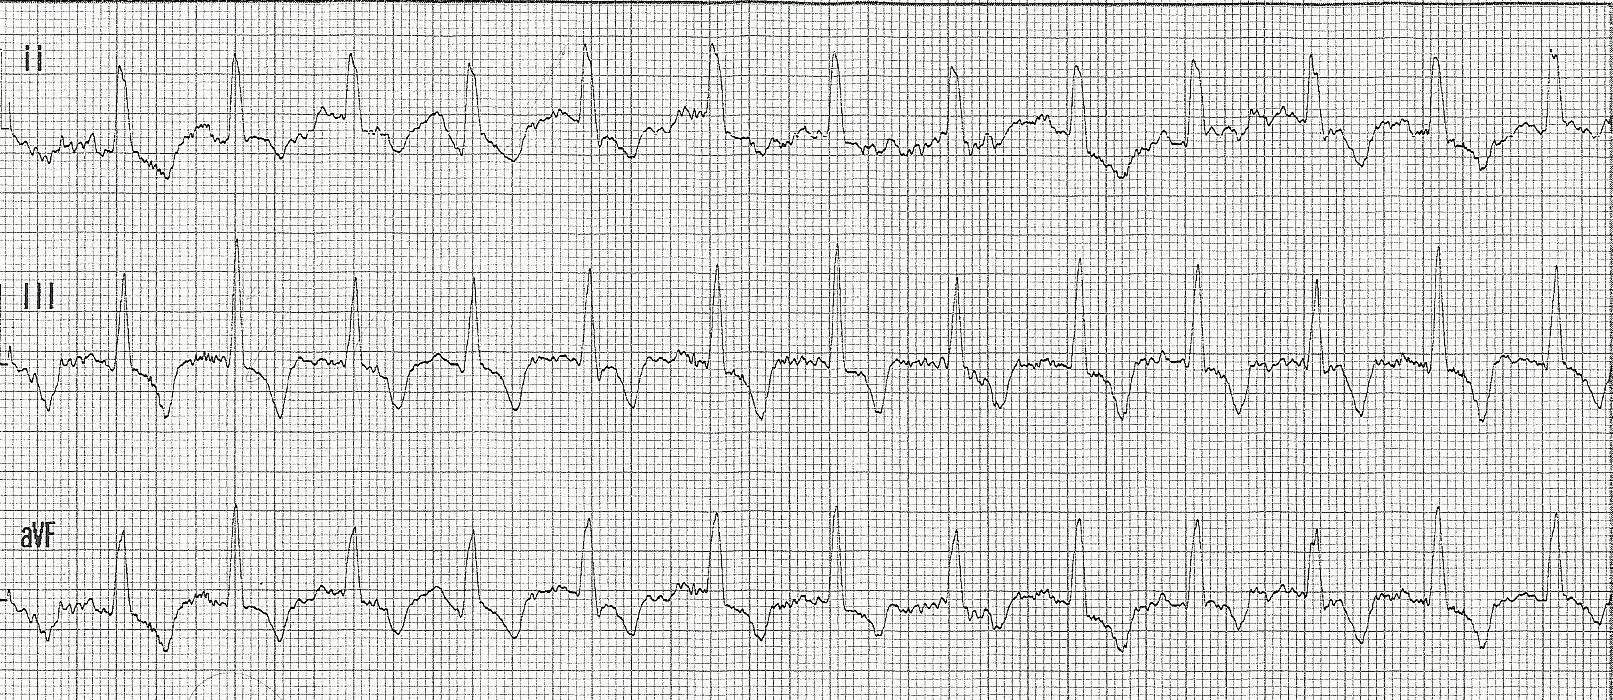 EKG Case Study #10: Mid-60s Male with Pulmonary Edema